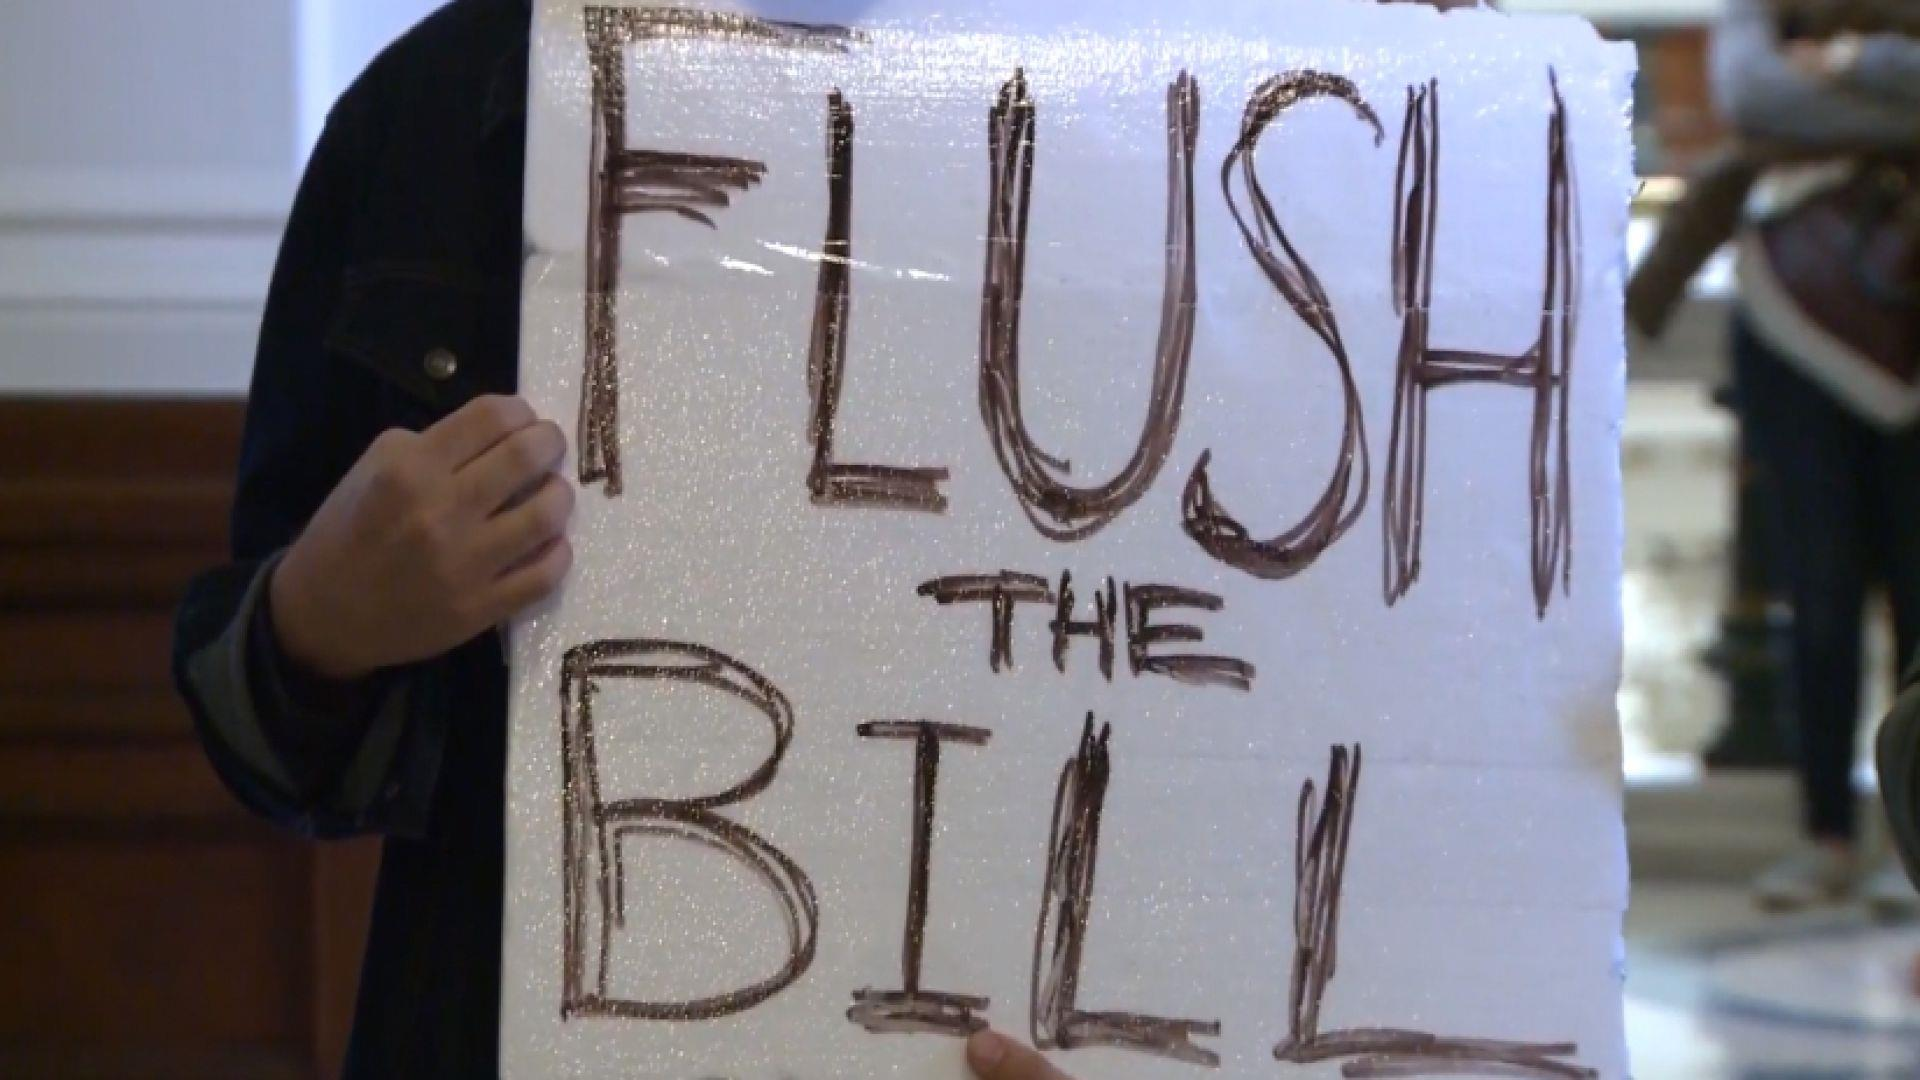 New Texas Bathroom Bill Causes Protests Nbc News